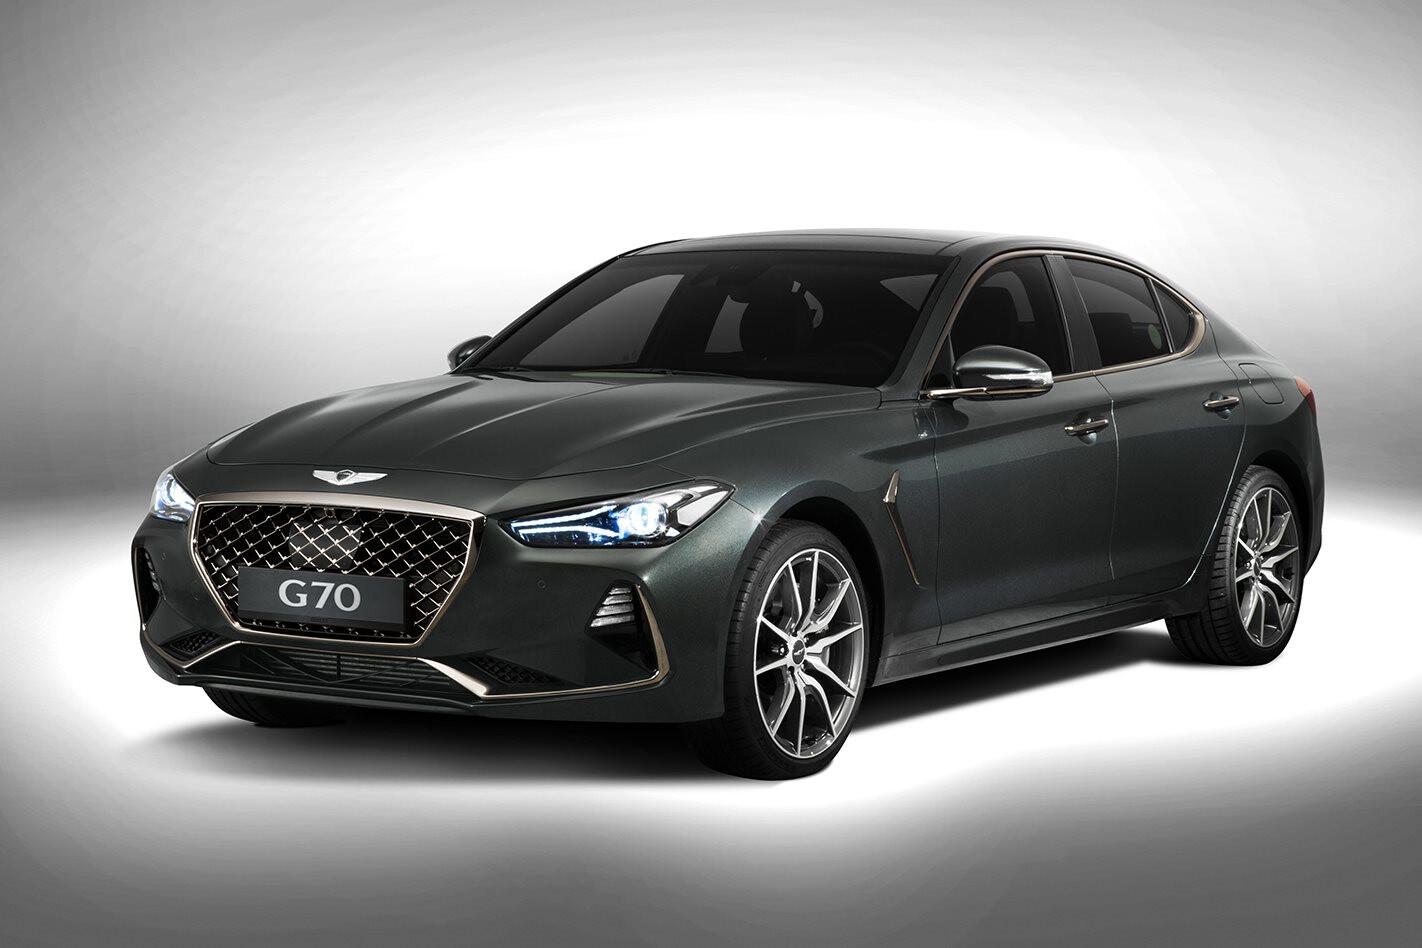 2018 Genesis G70 revealed